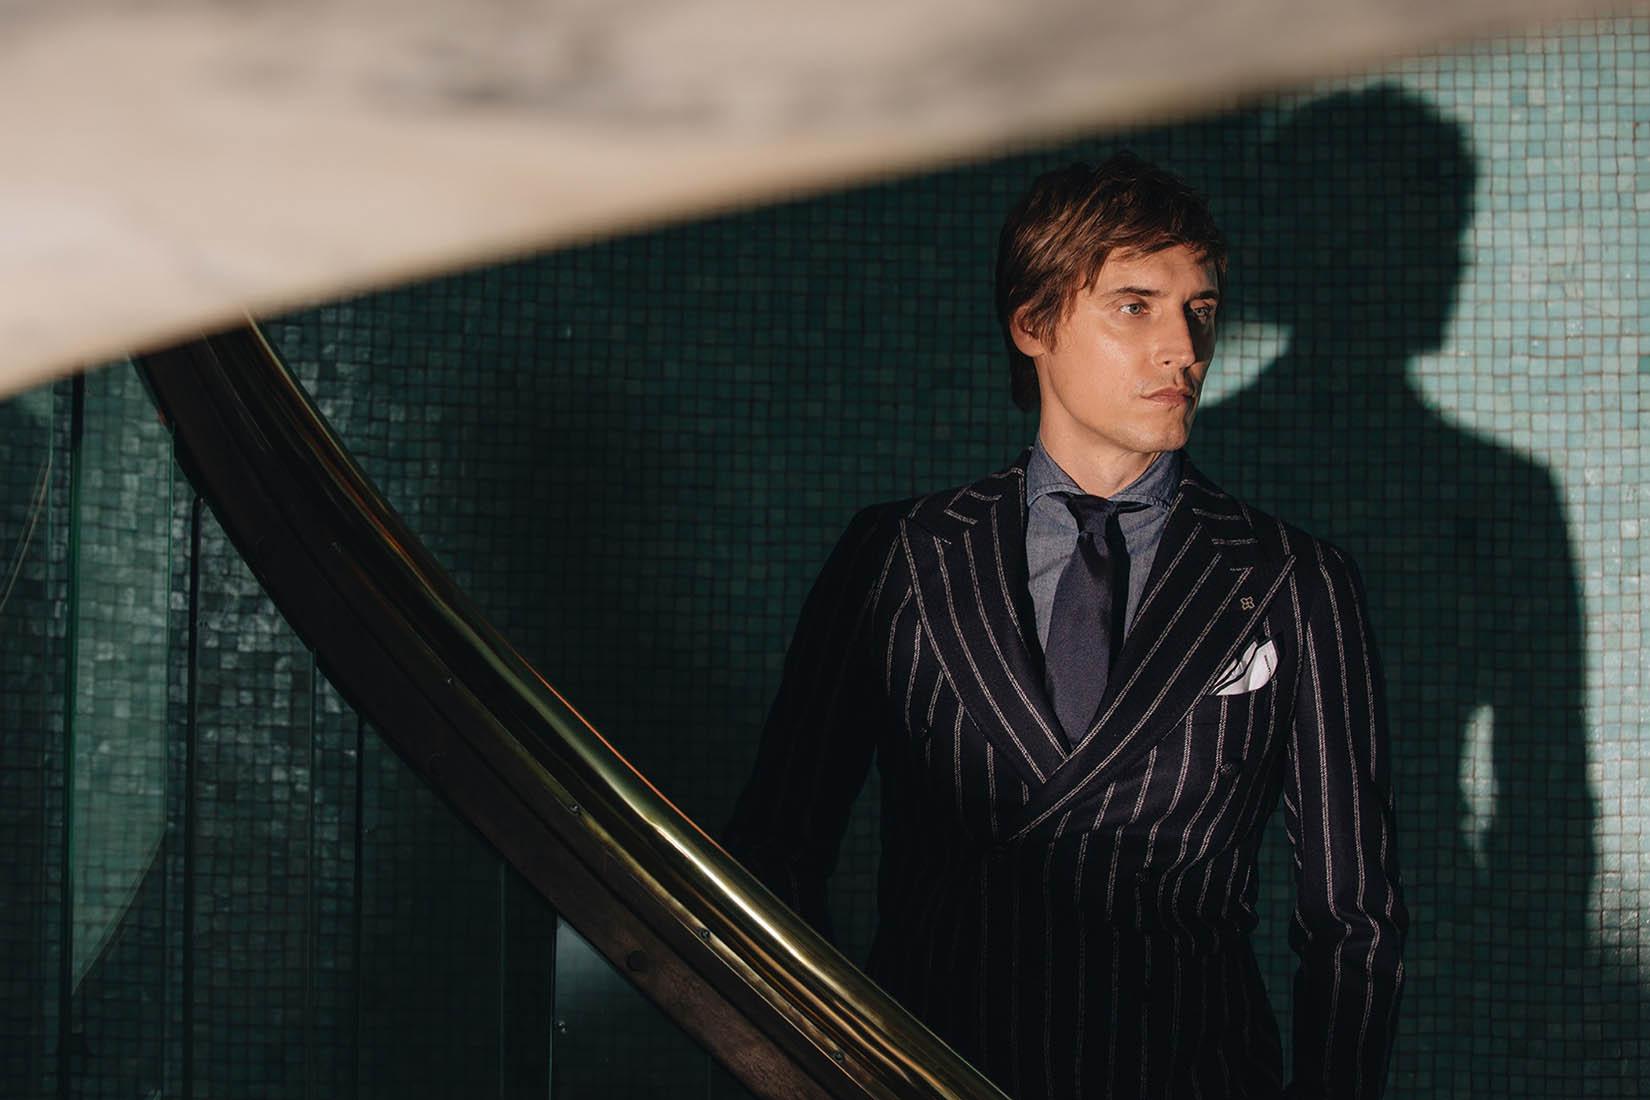 best suit brands men tagliatore review Luxe Digital